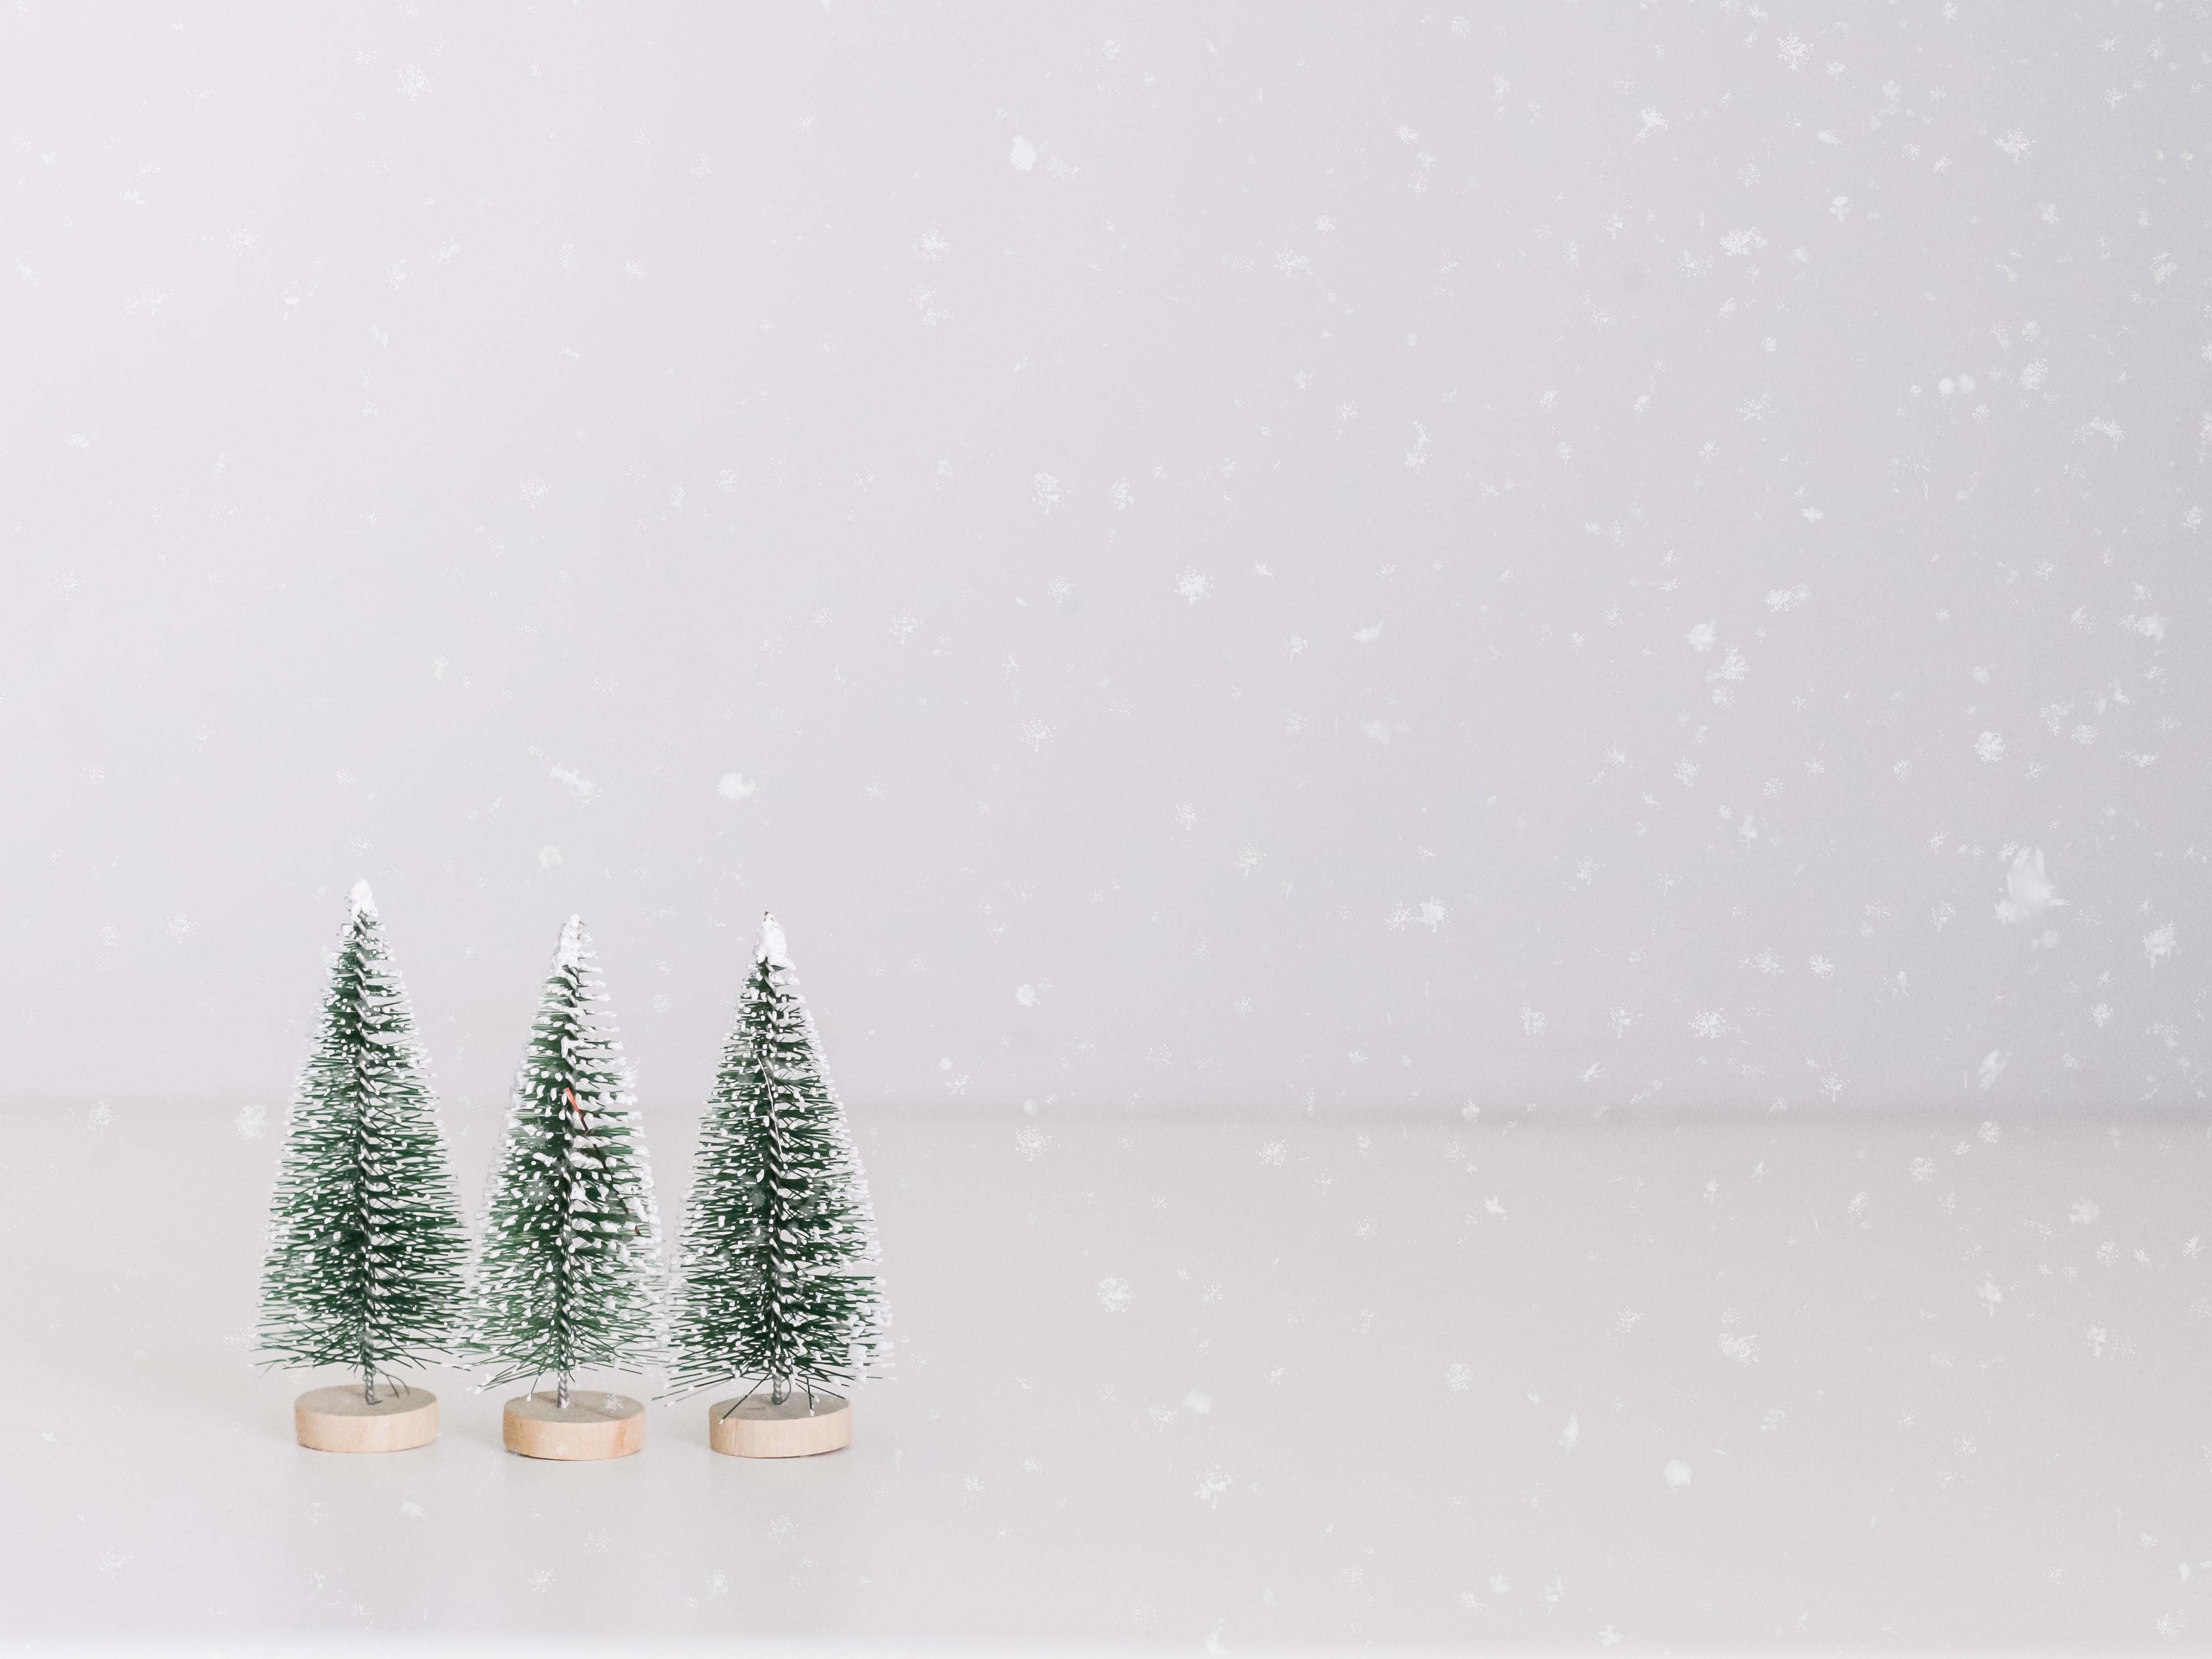 tiny small fake fir trees